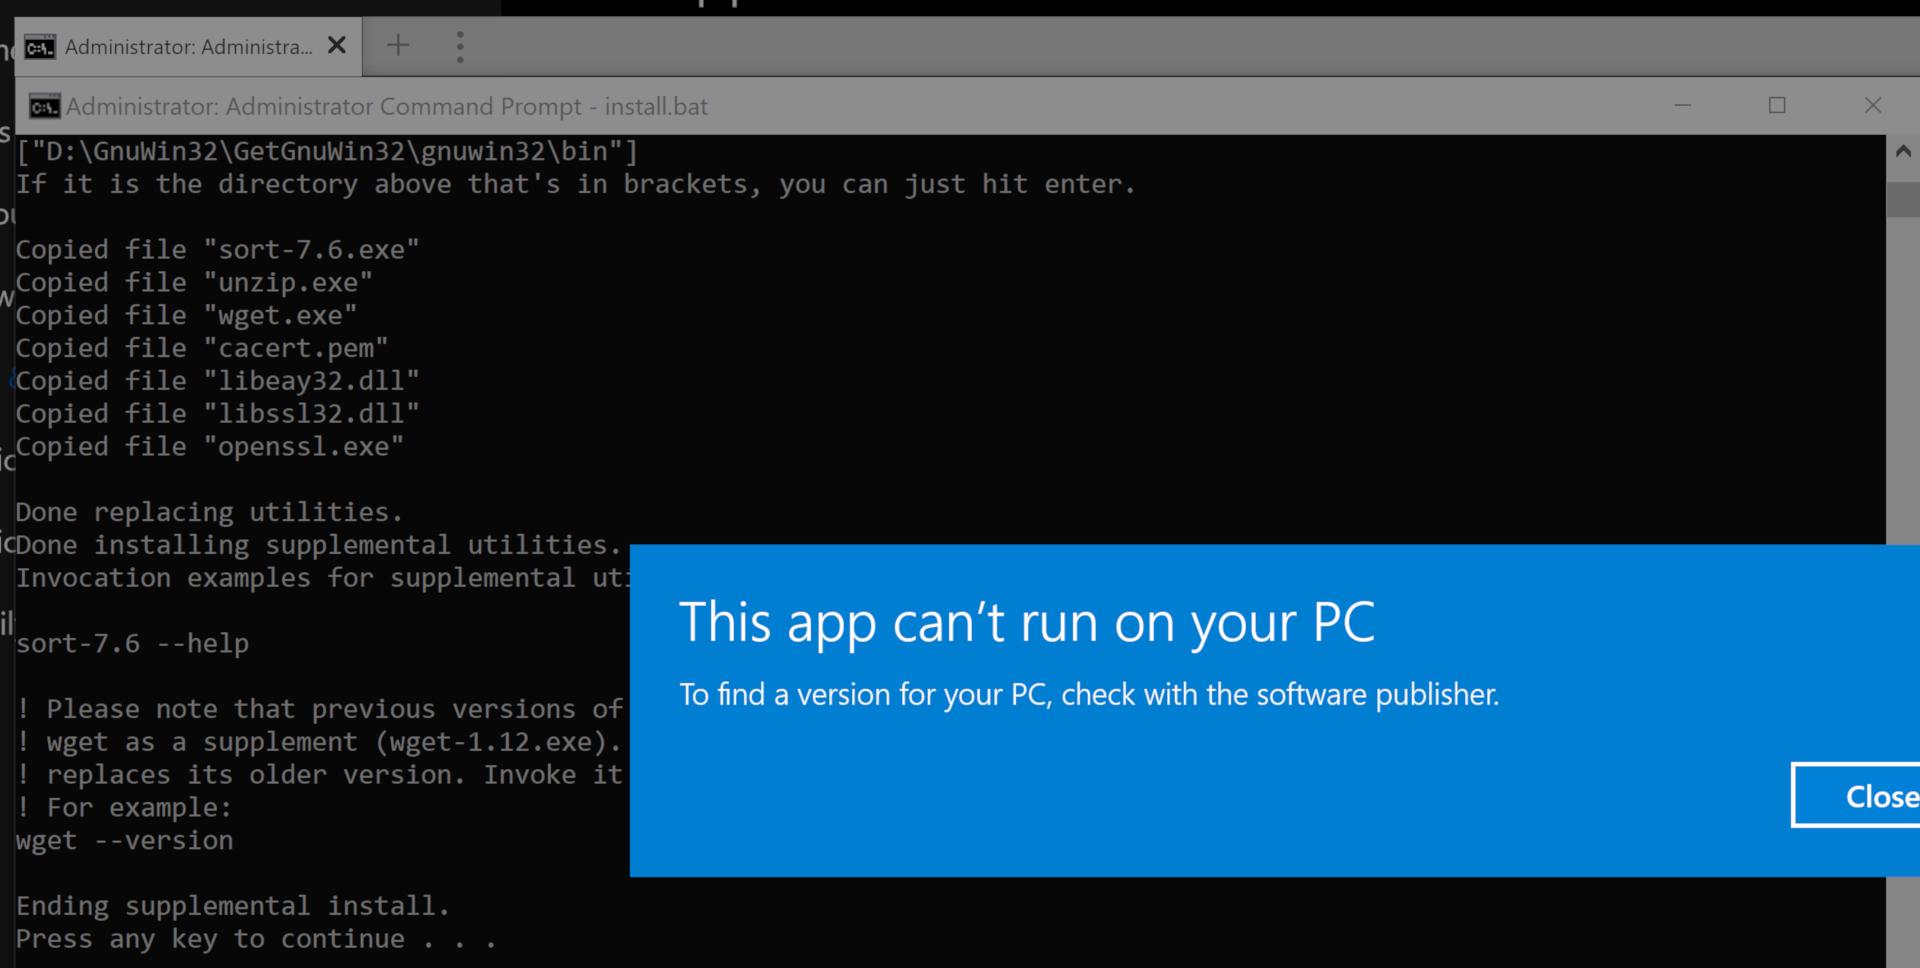 GnuWin32 / Bugs / #32 On Windows, install bat keeps trying